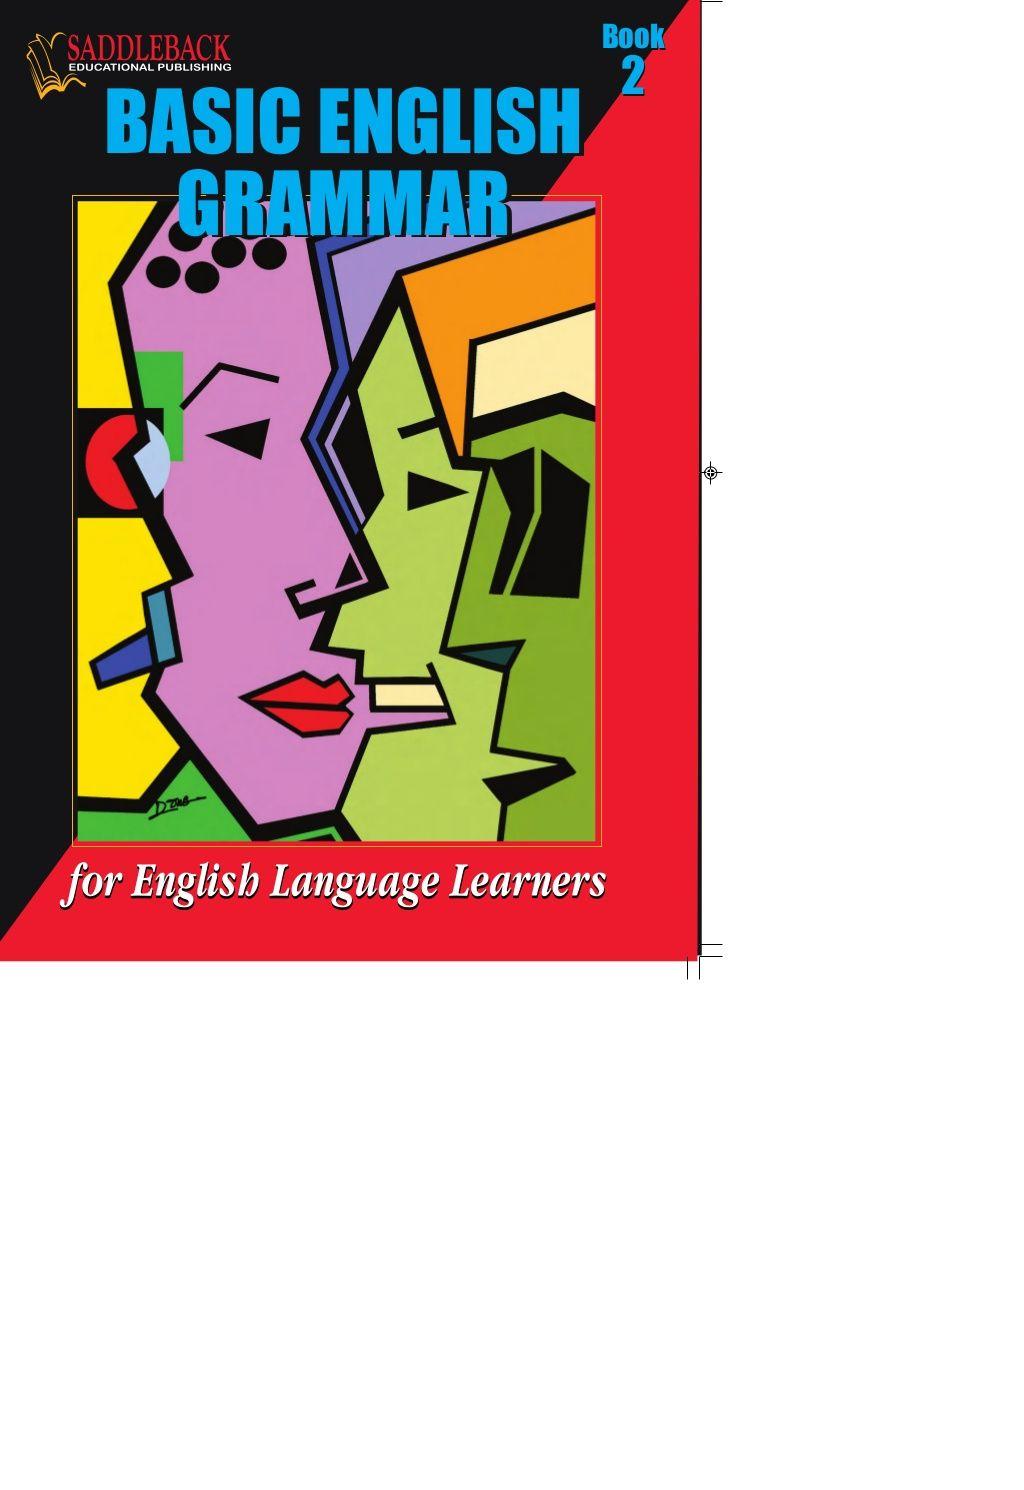 Test your English Level.